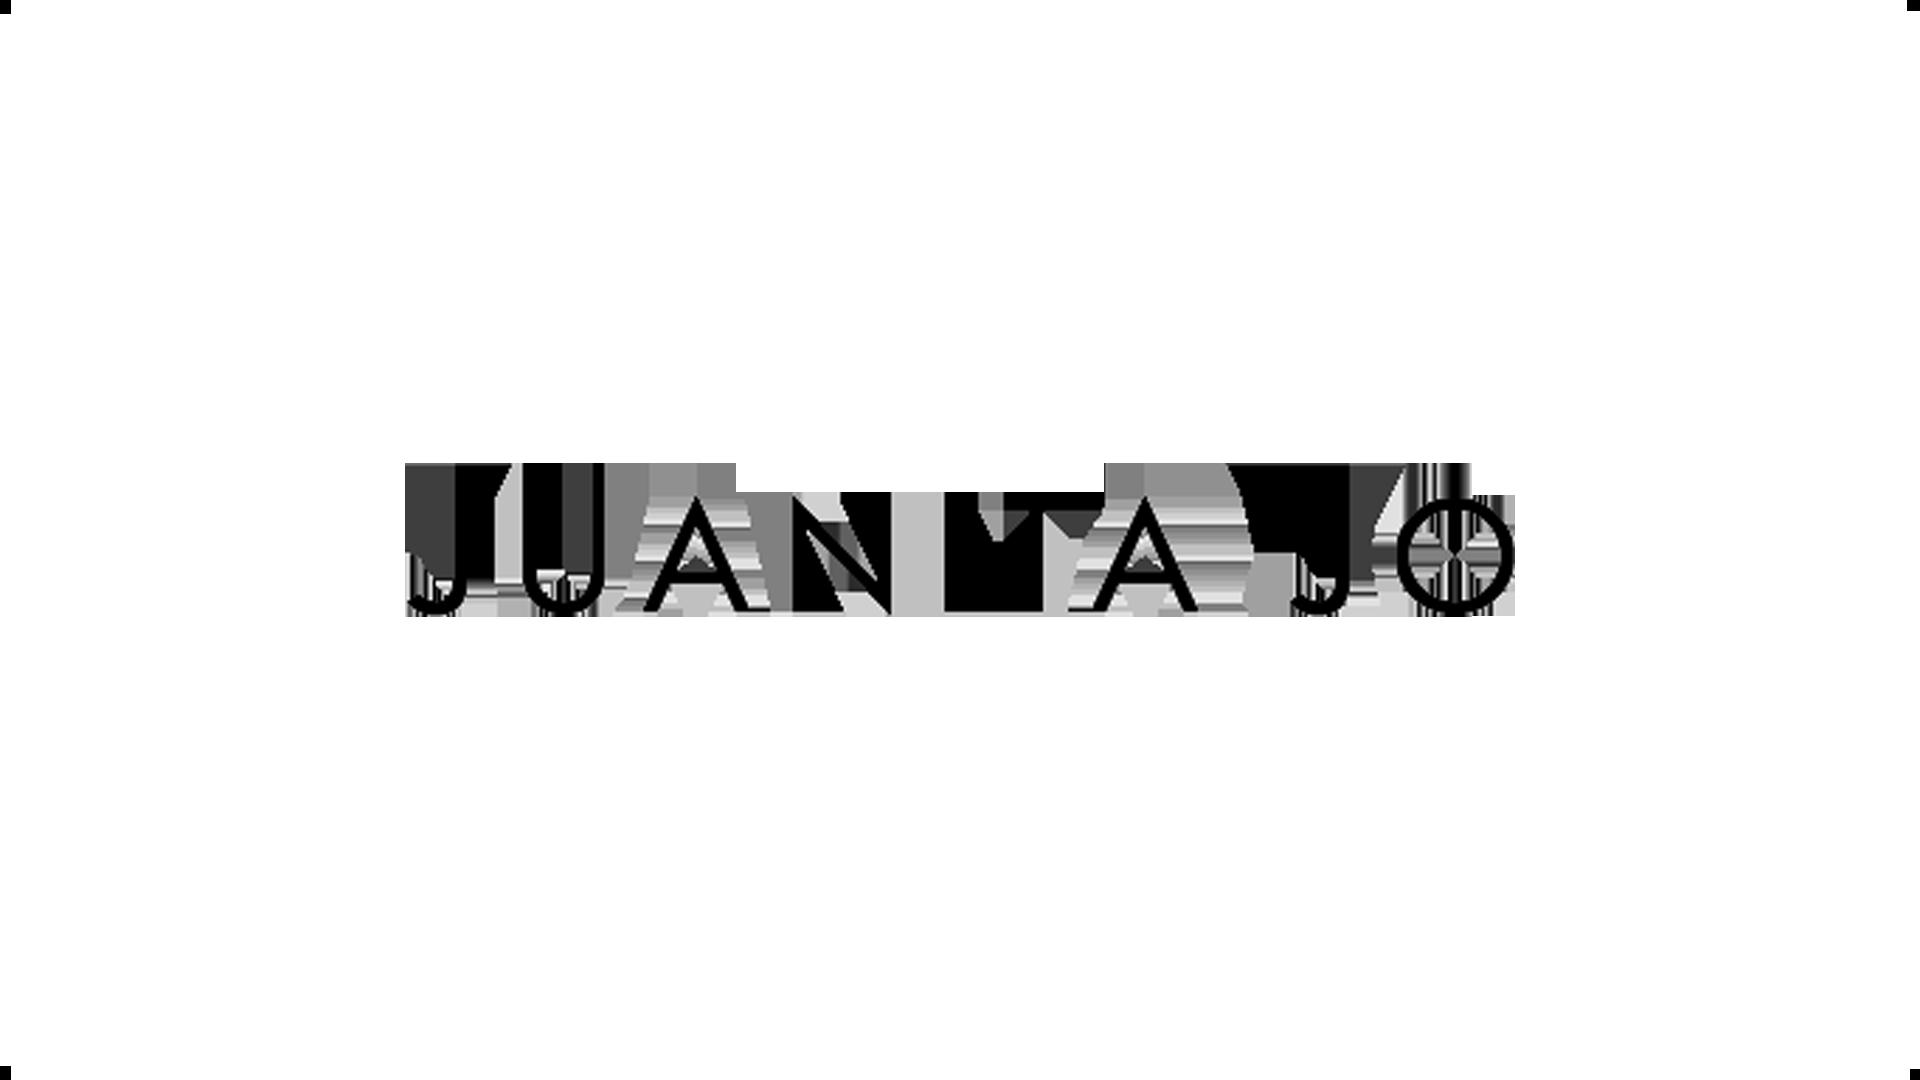 LIVE MULTIMARCA - Juanita-Jo